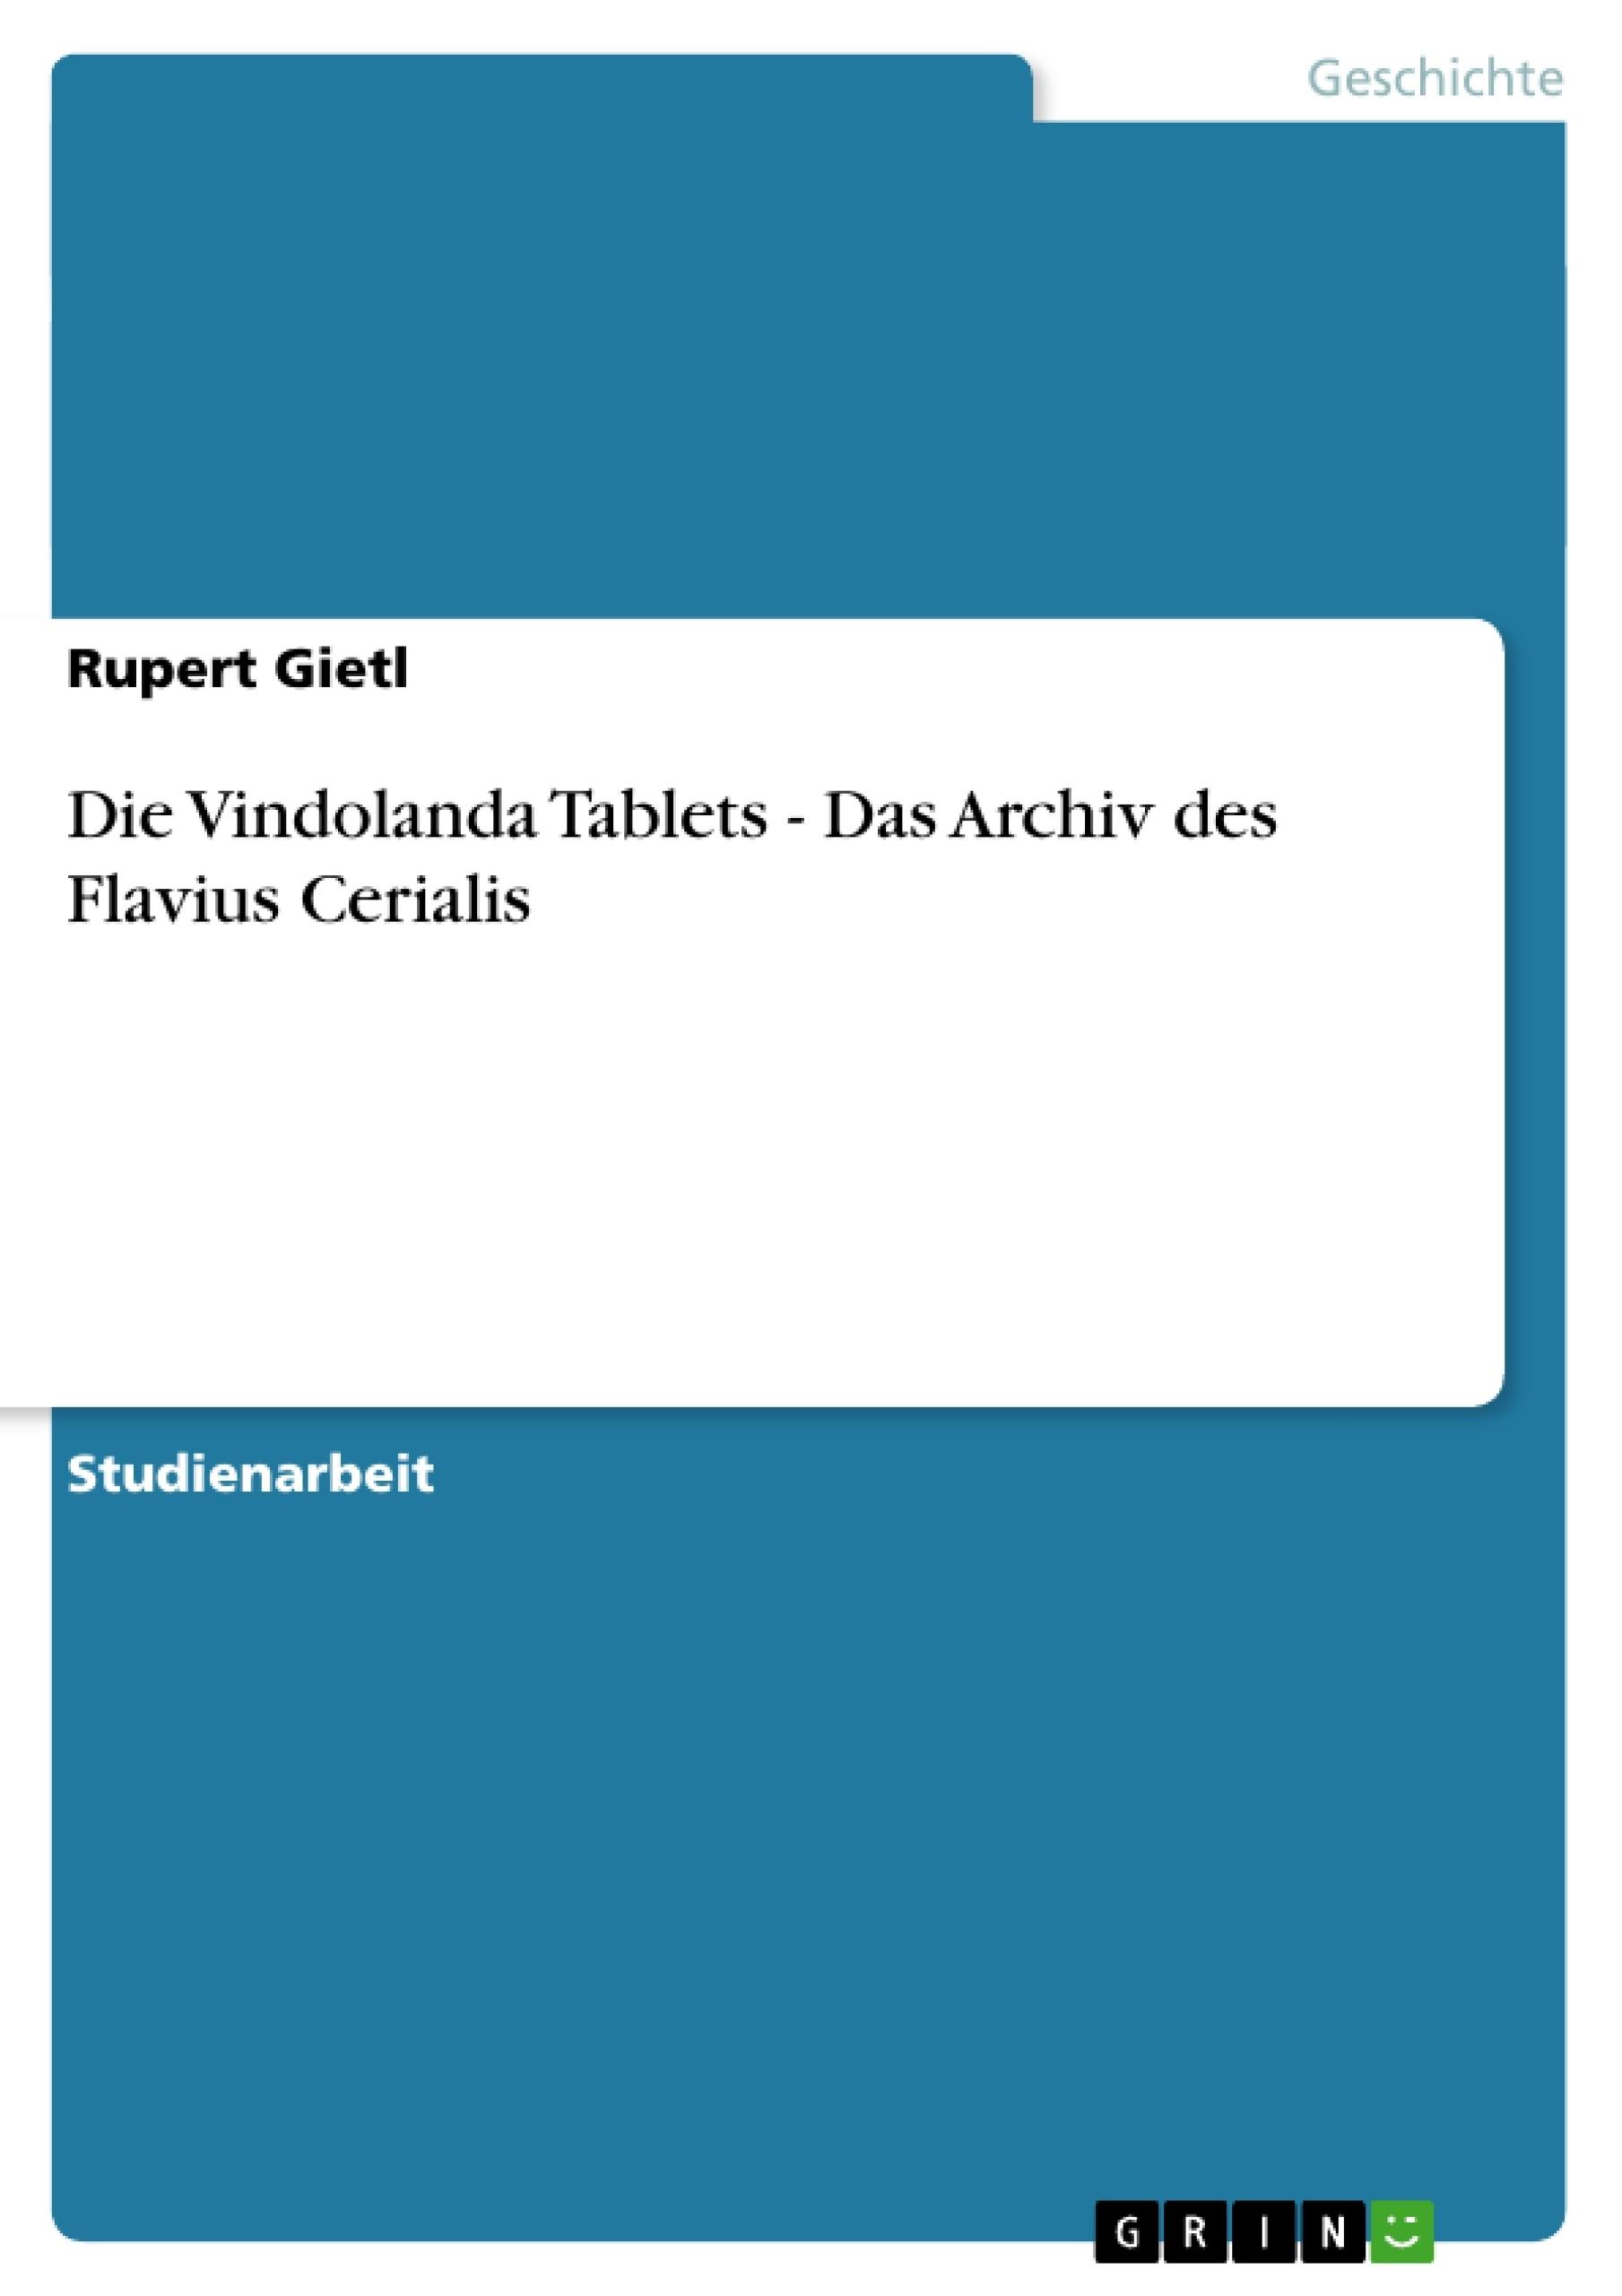 Titel: Die Vindolanda Tablets - Das Archiv des Flavius Cerialis